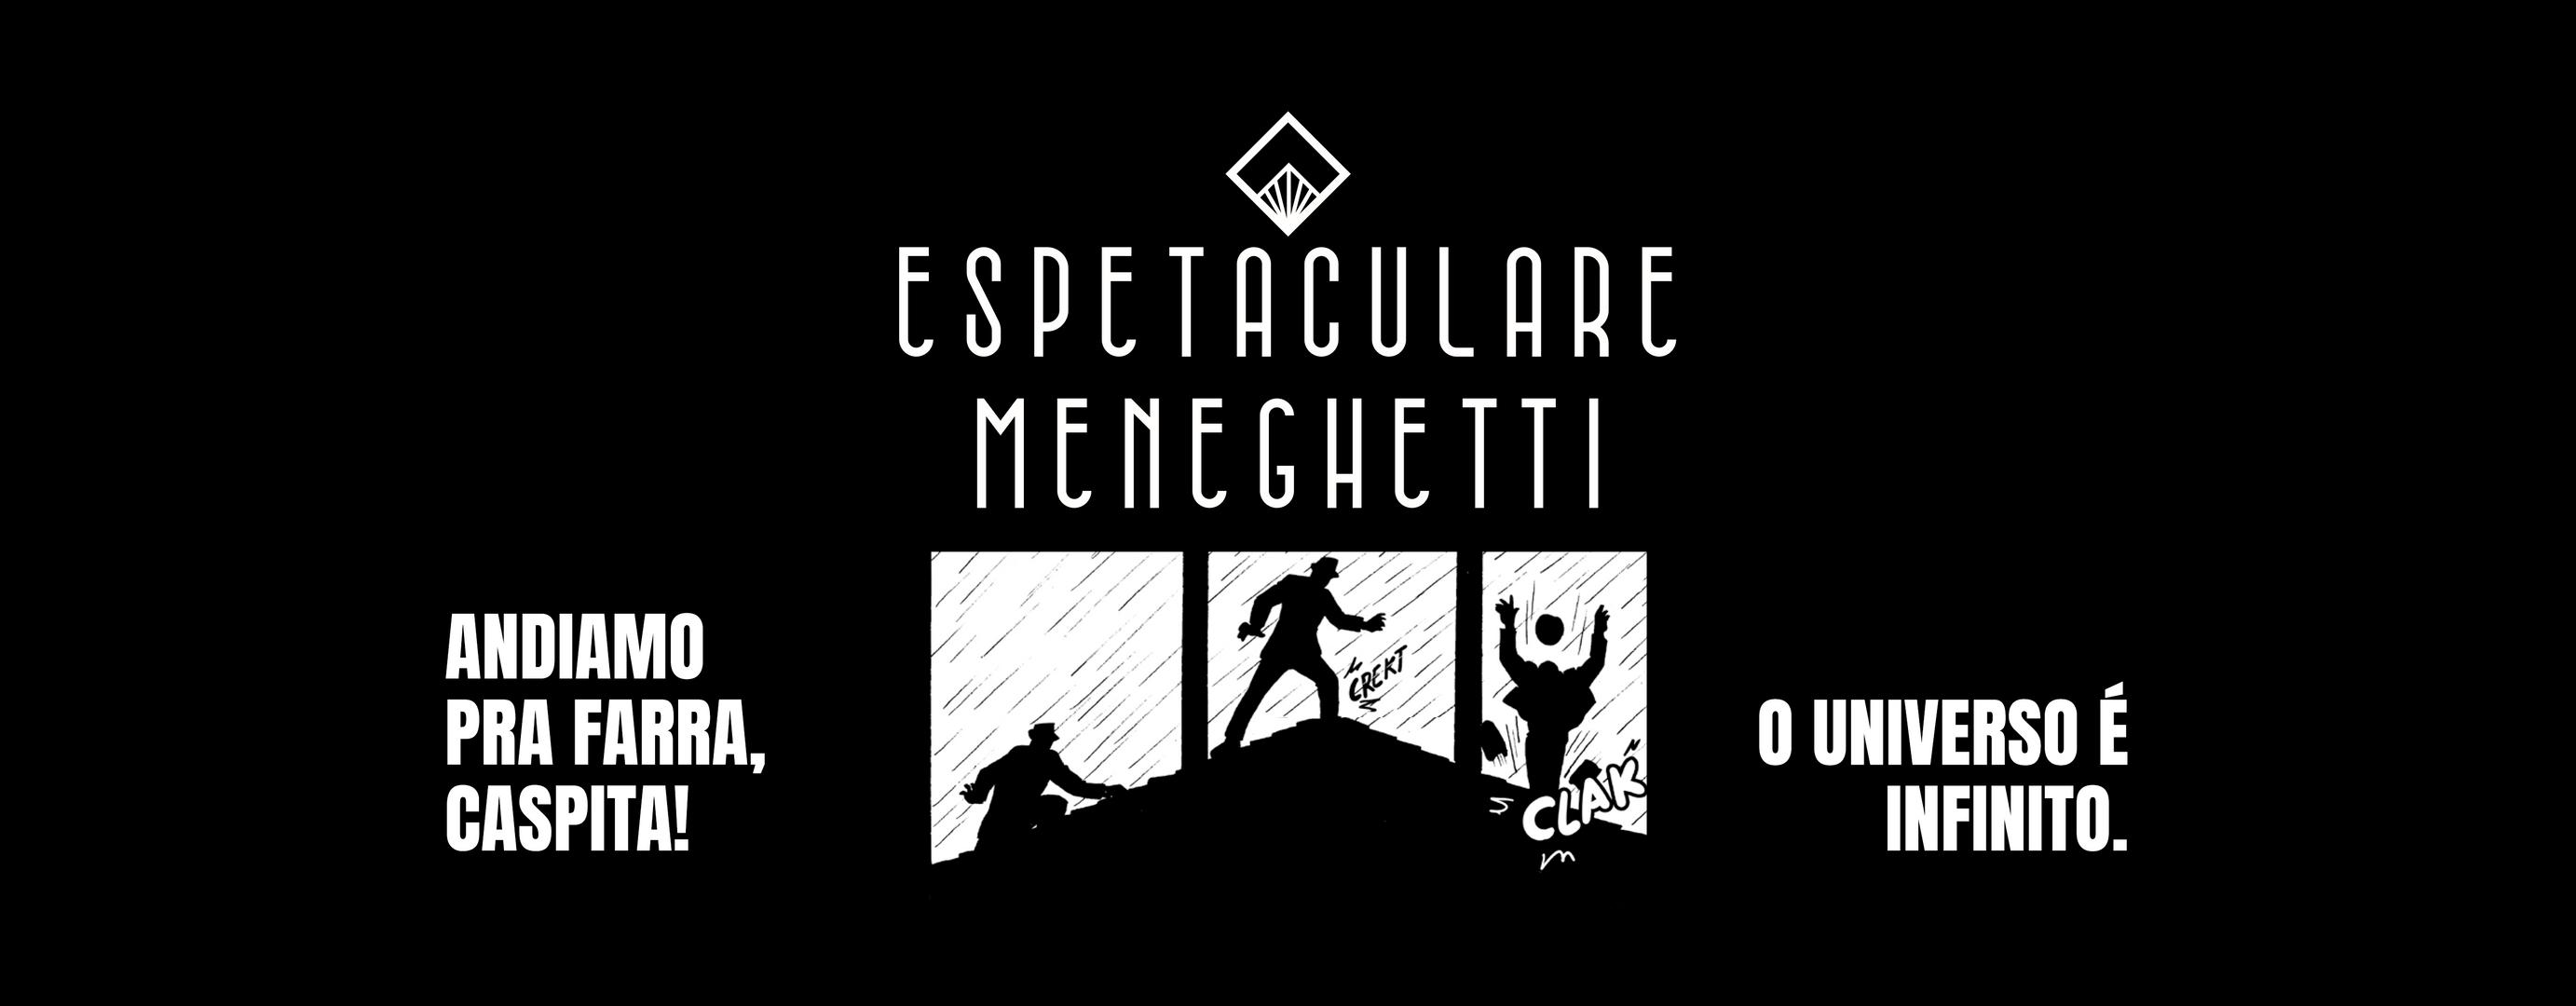 Meneghetti_Site.png